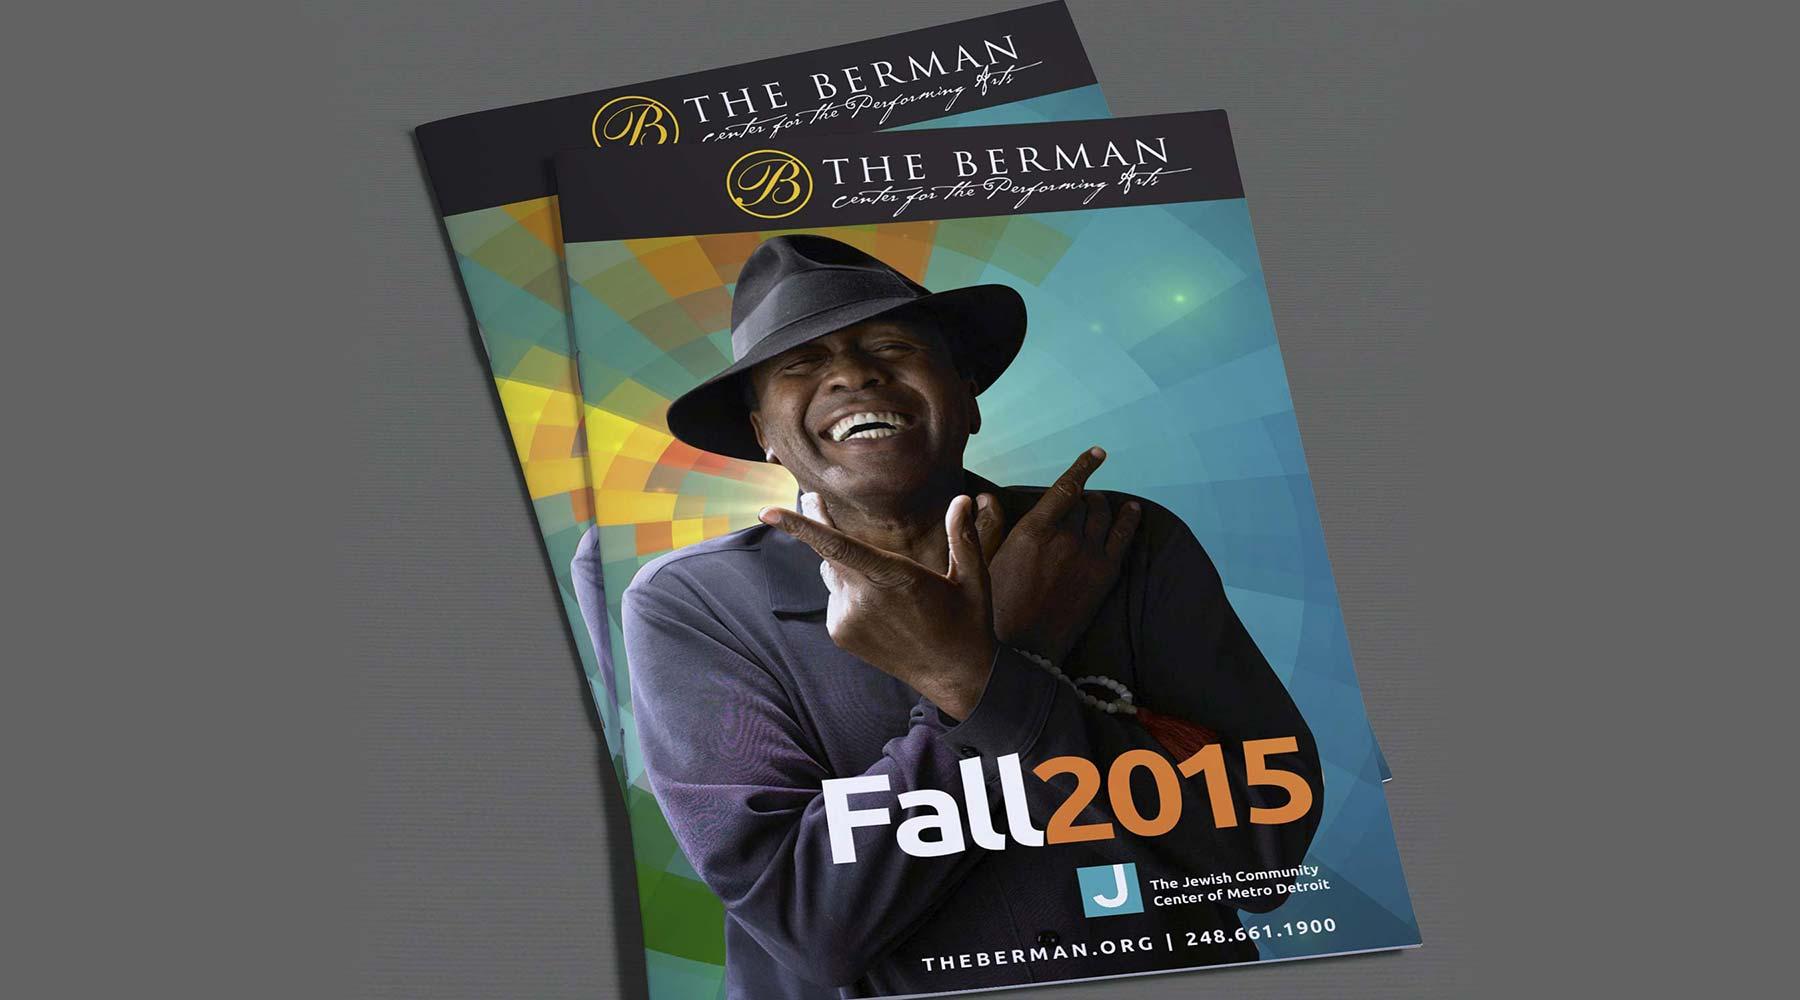 The Berman Theater 2015-16 Season Brochure